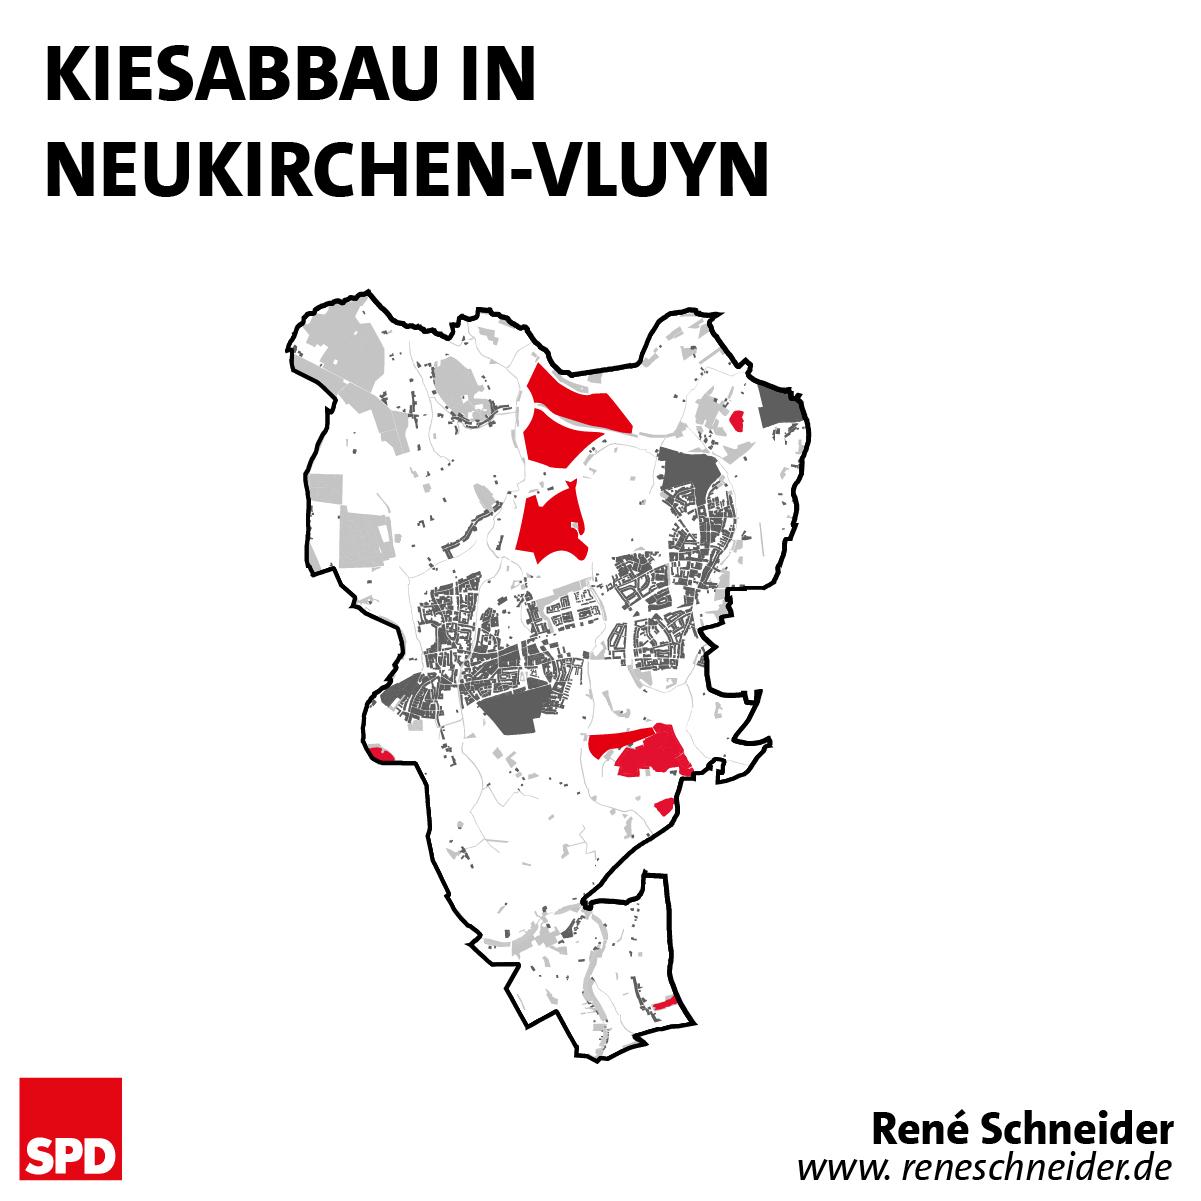 Kiesabbau in Neukirchen-Vluyn